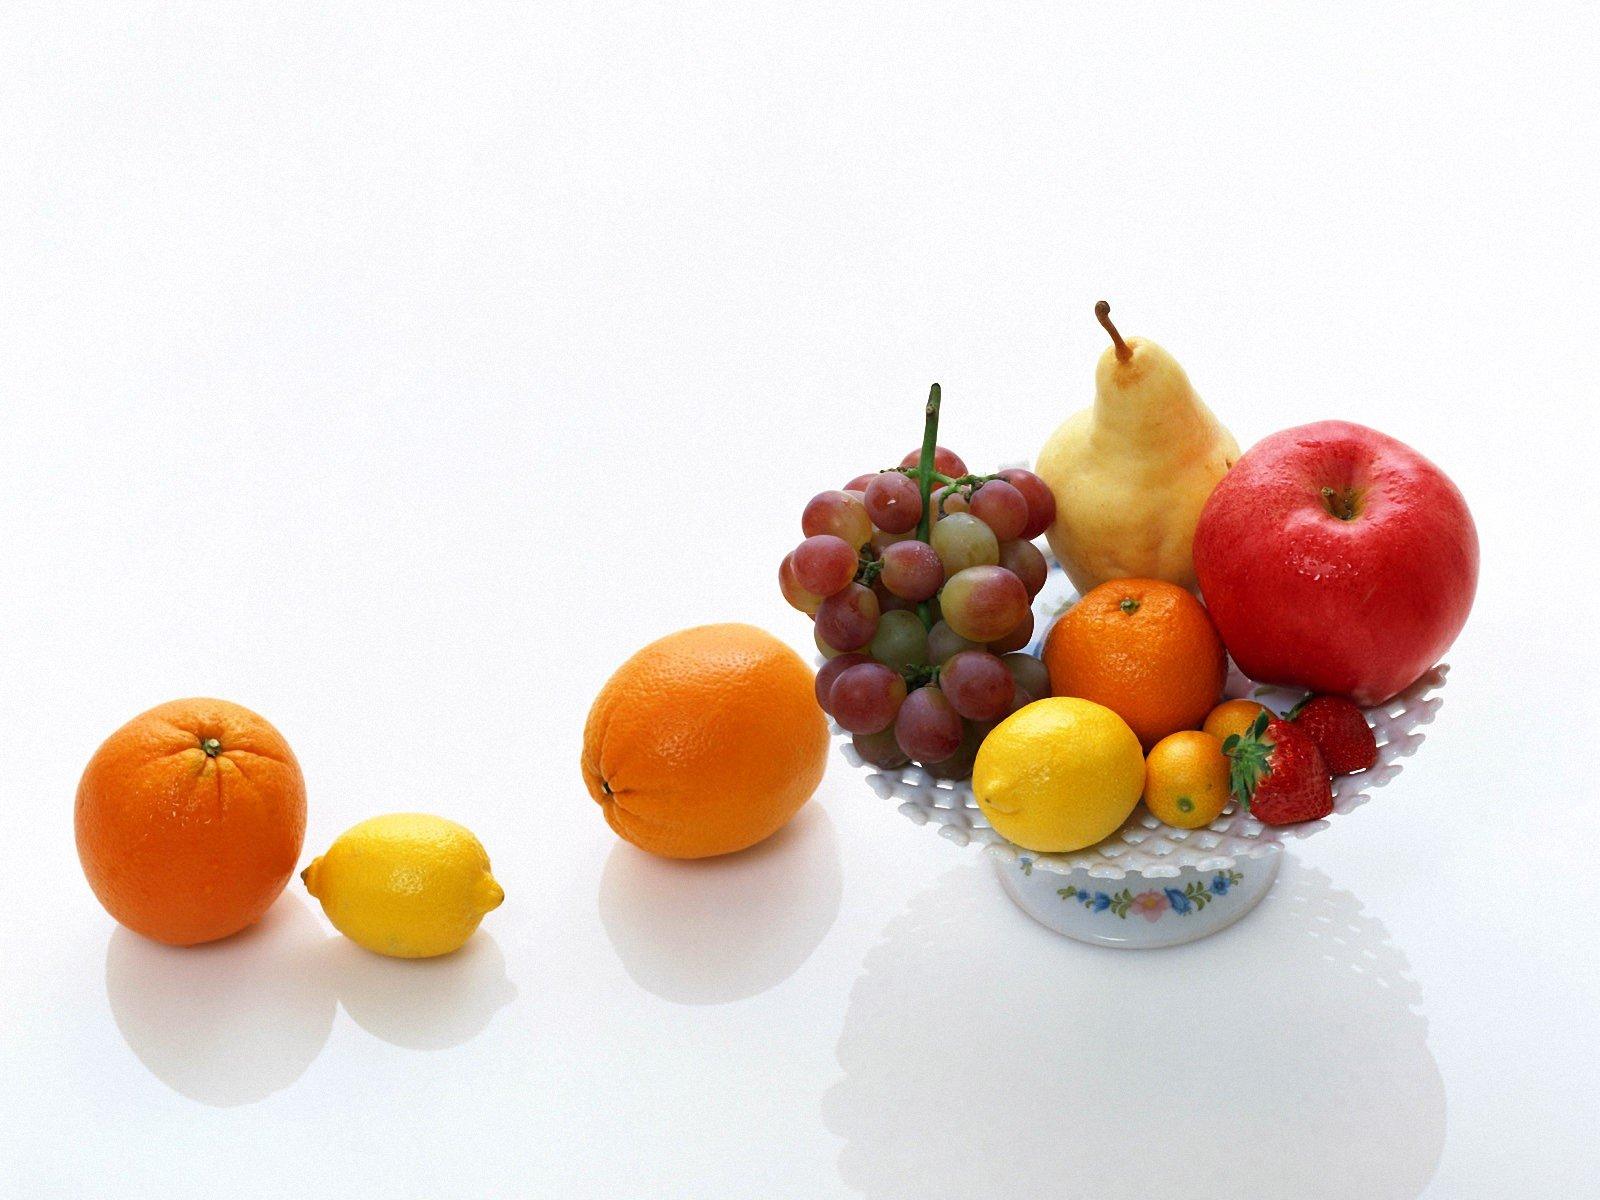 Hd fruits wallpapers 1600x1200 - Food Fruit Wallpaper